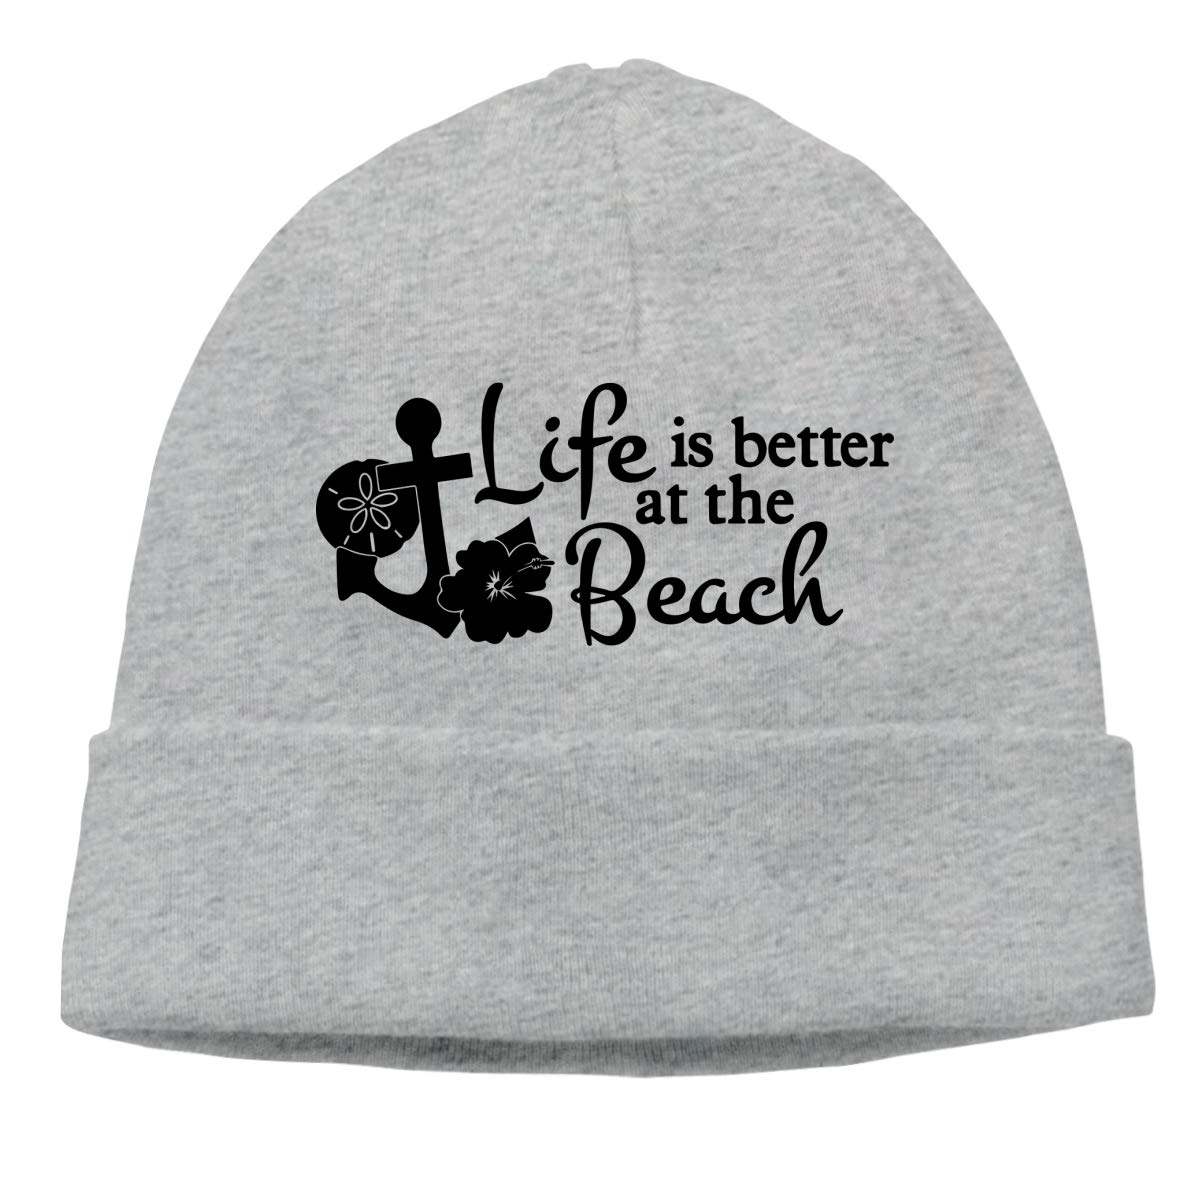 A17BTM Mens and Womens Skullies Beanies Life is Better at The Beach Cute Skull Cap Sports Fan Warm Hat Gray